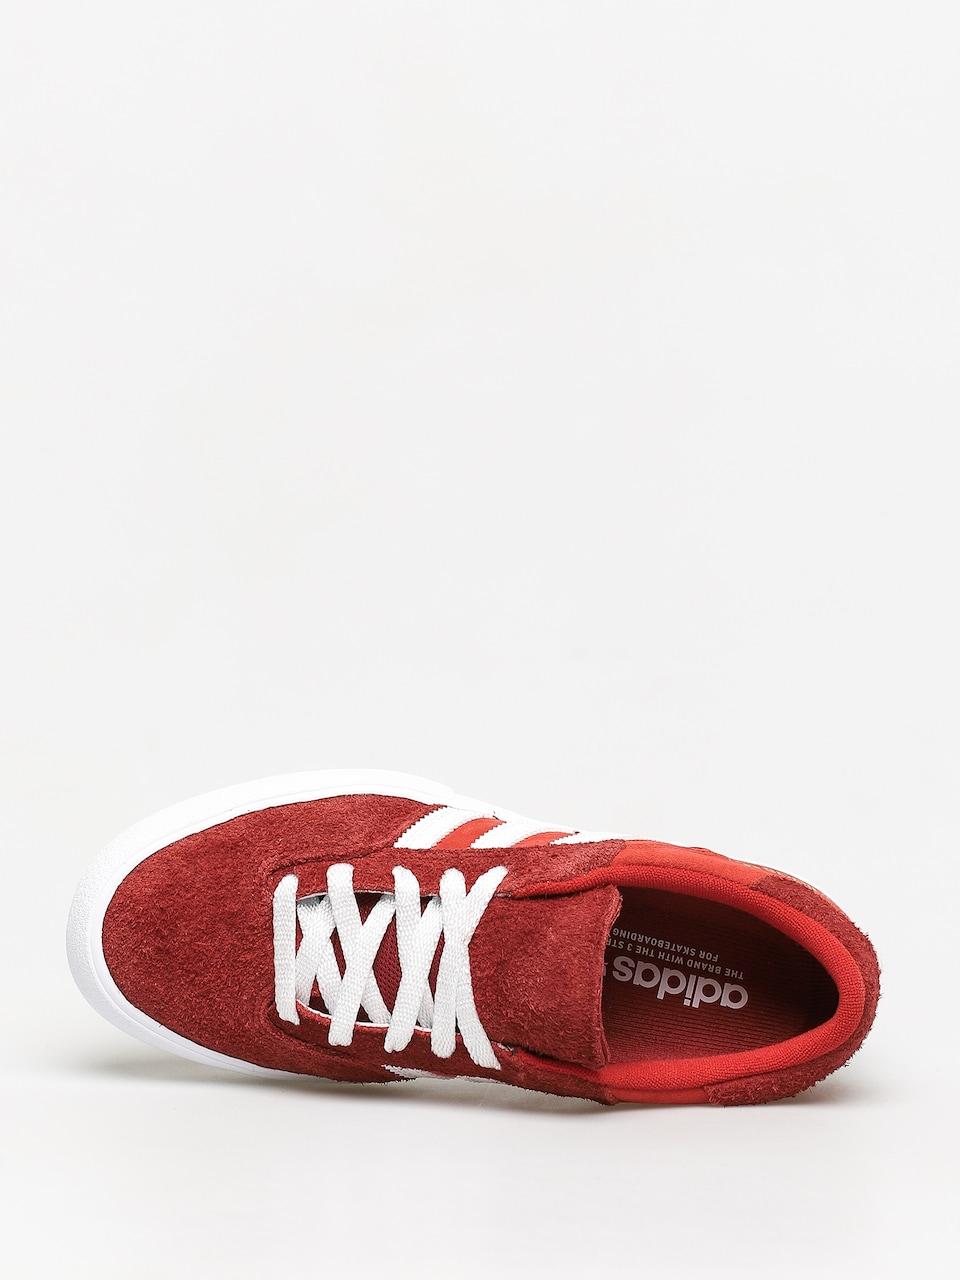 Buty adidas Matchbreak Super (stbricftwwhtgoldmt)